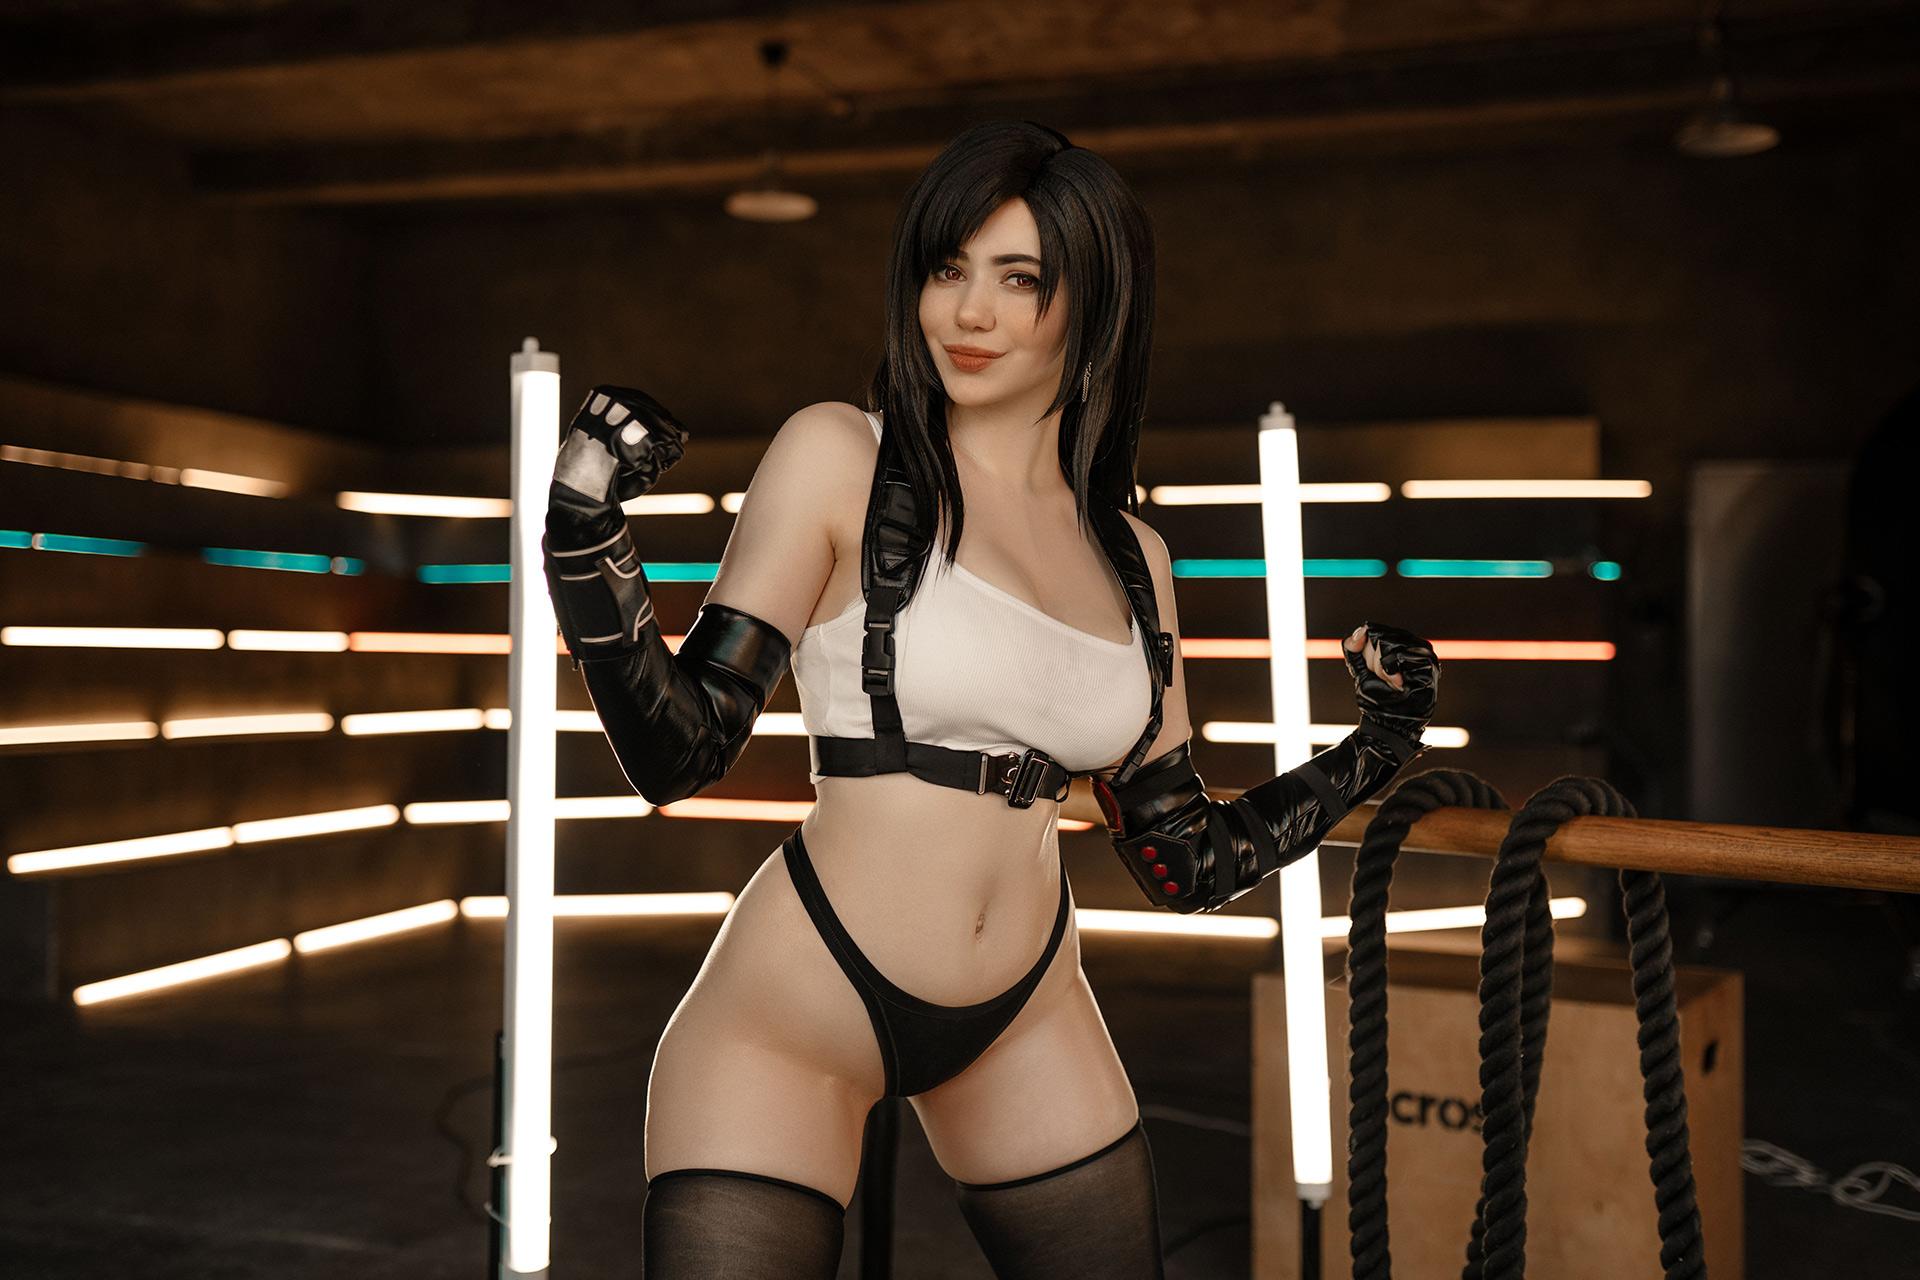 alina becker cosplay tifa lockhart final fantasy 5